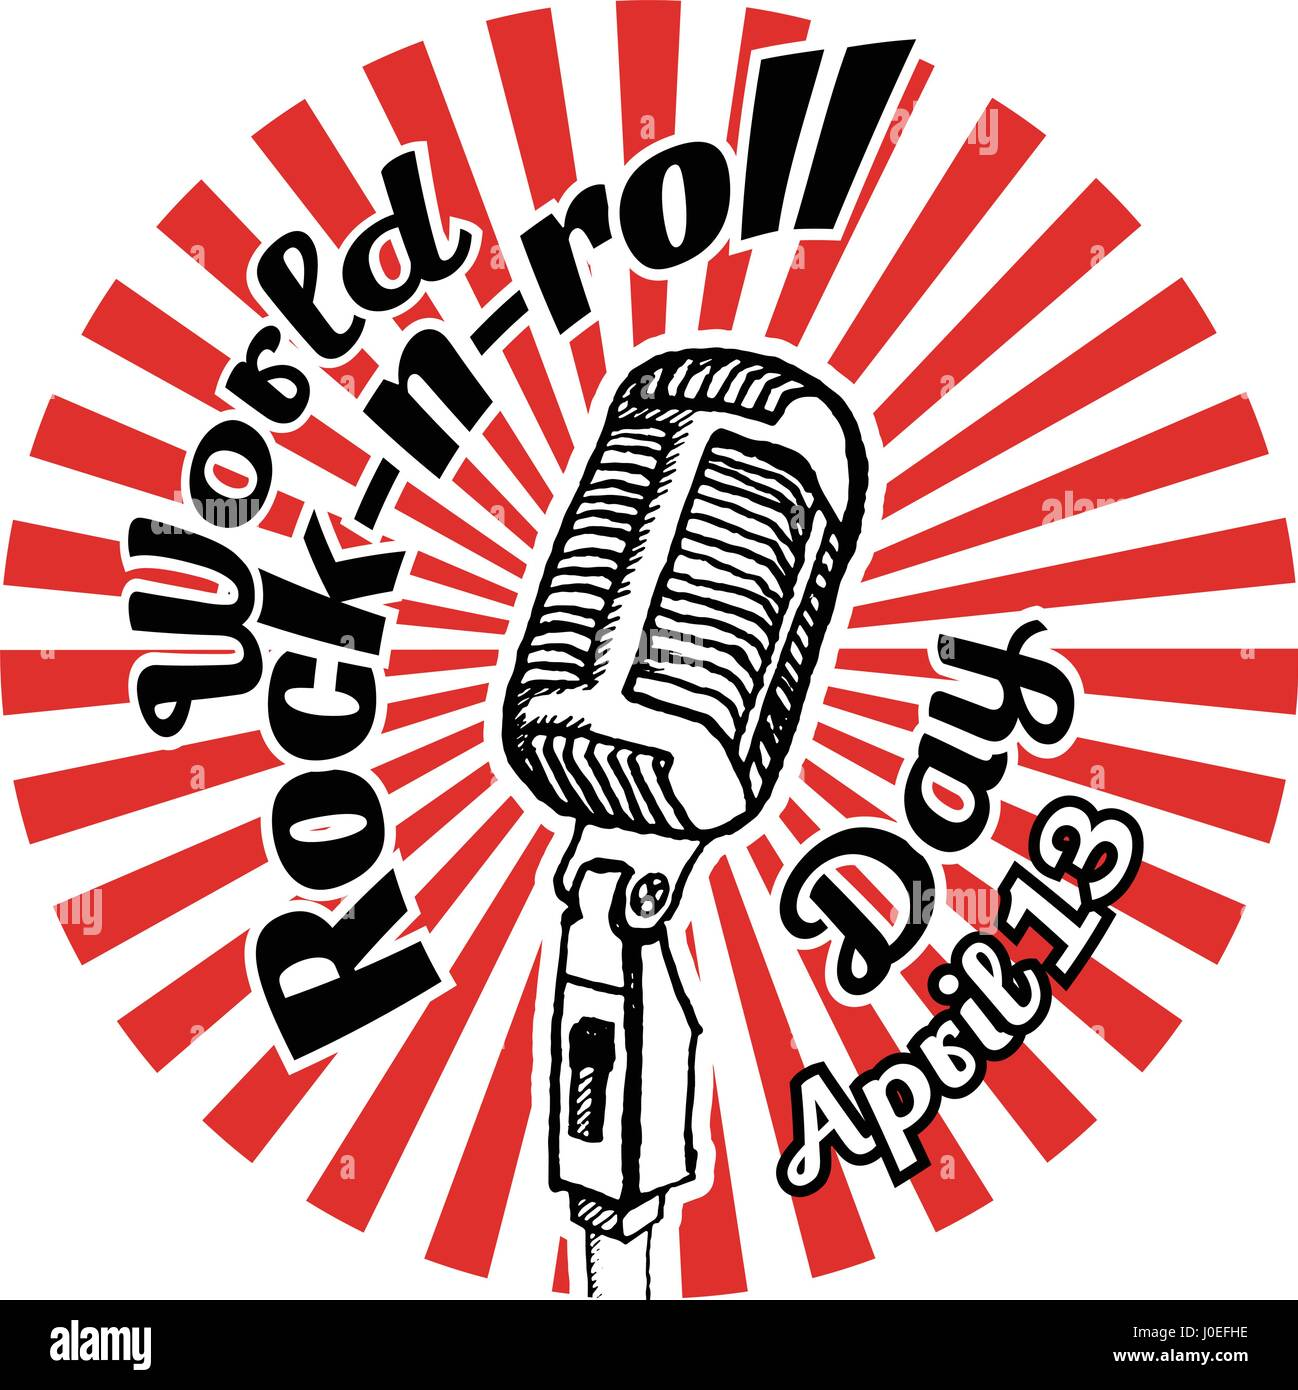 World Rock-n-roll Day Stock Vector Art & Illustration ...